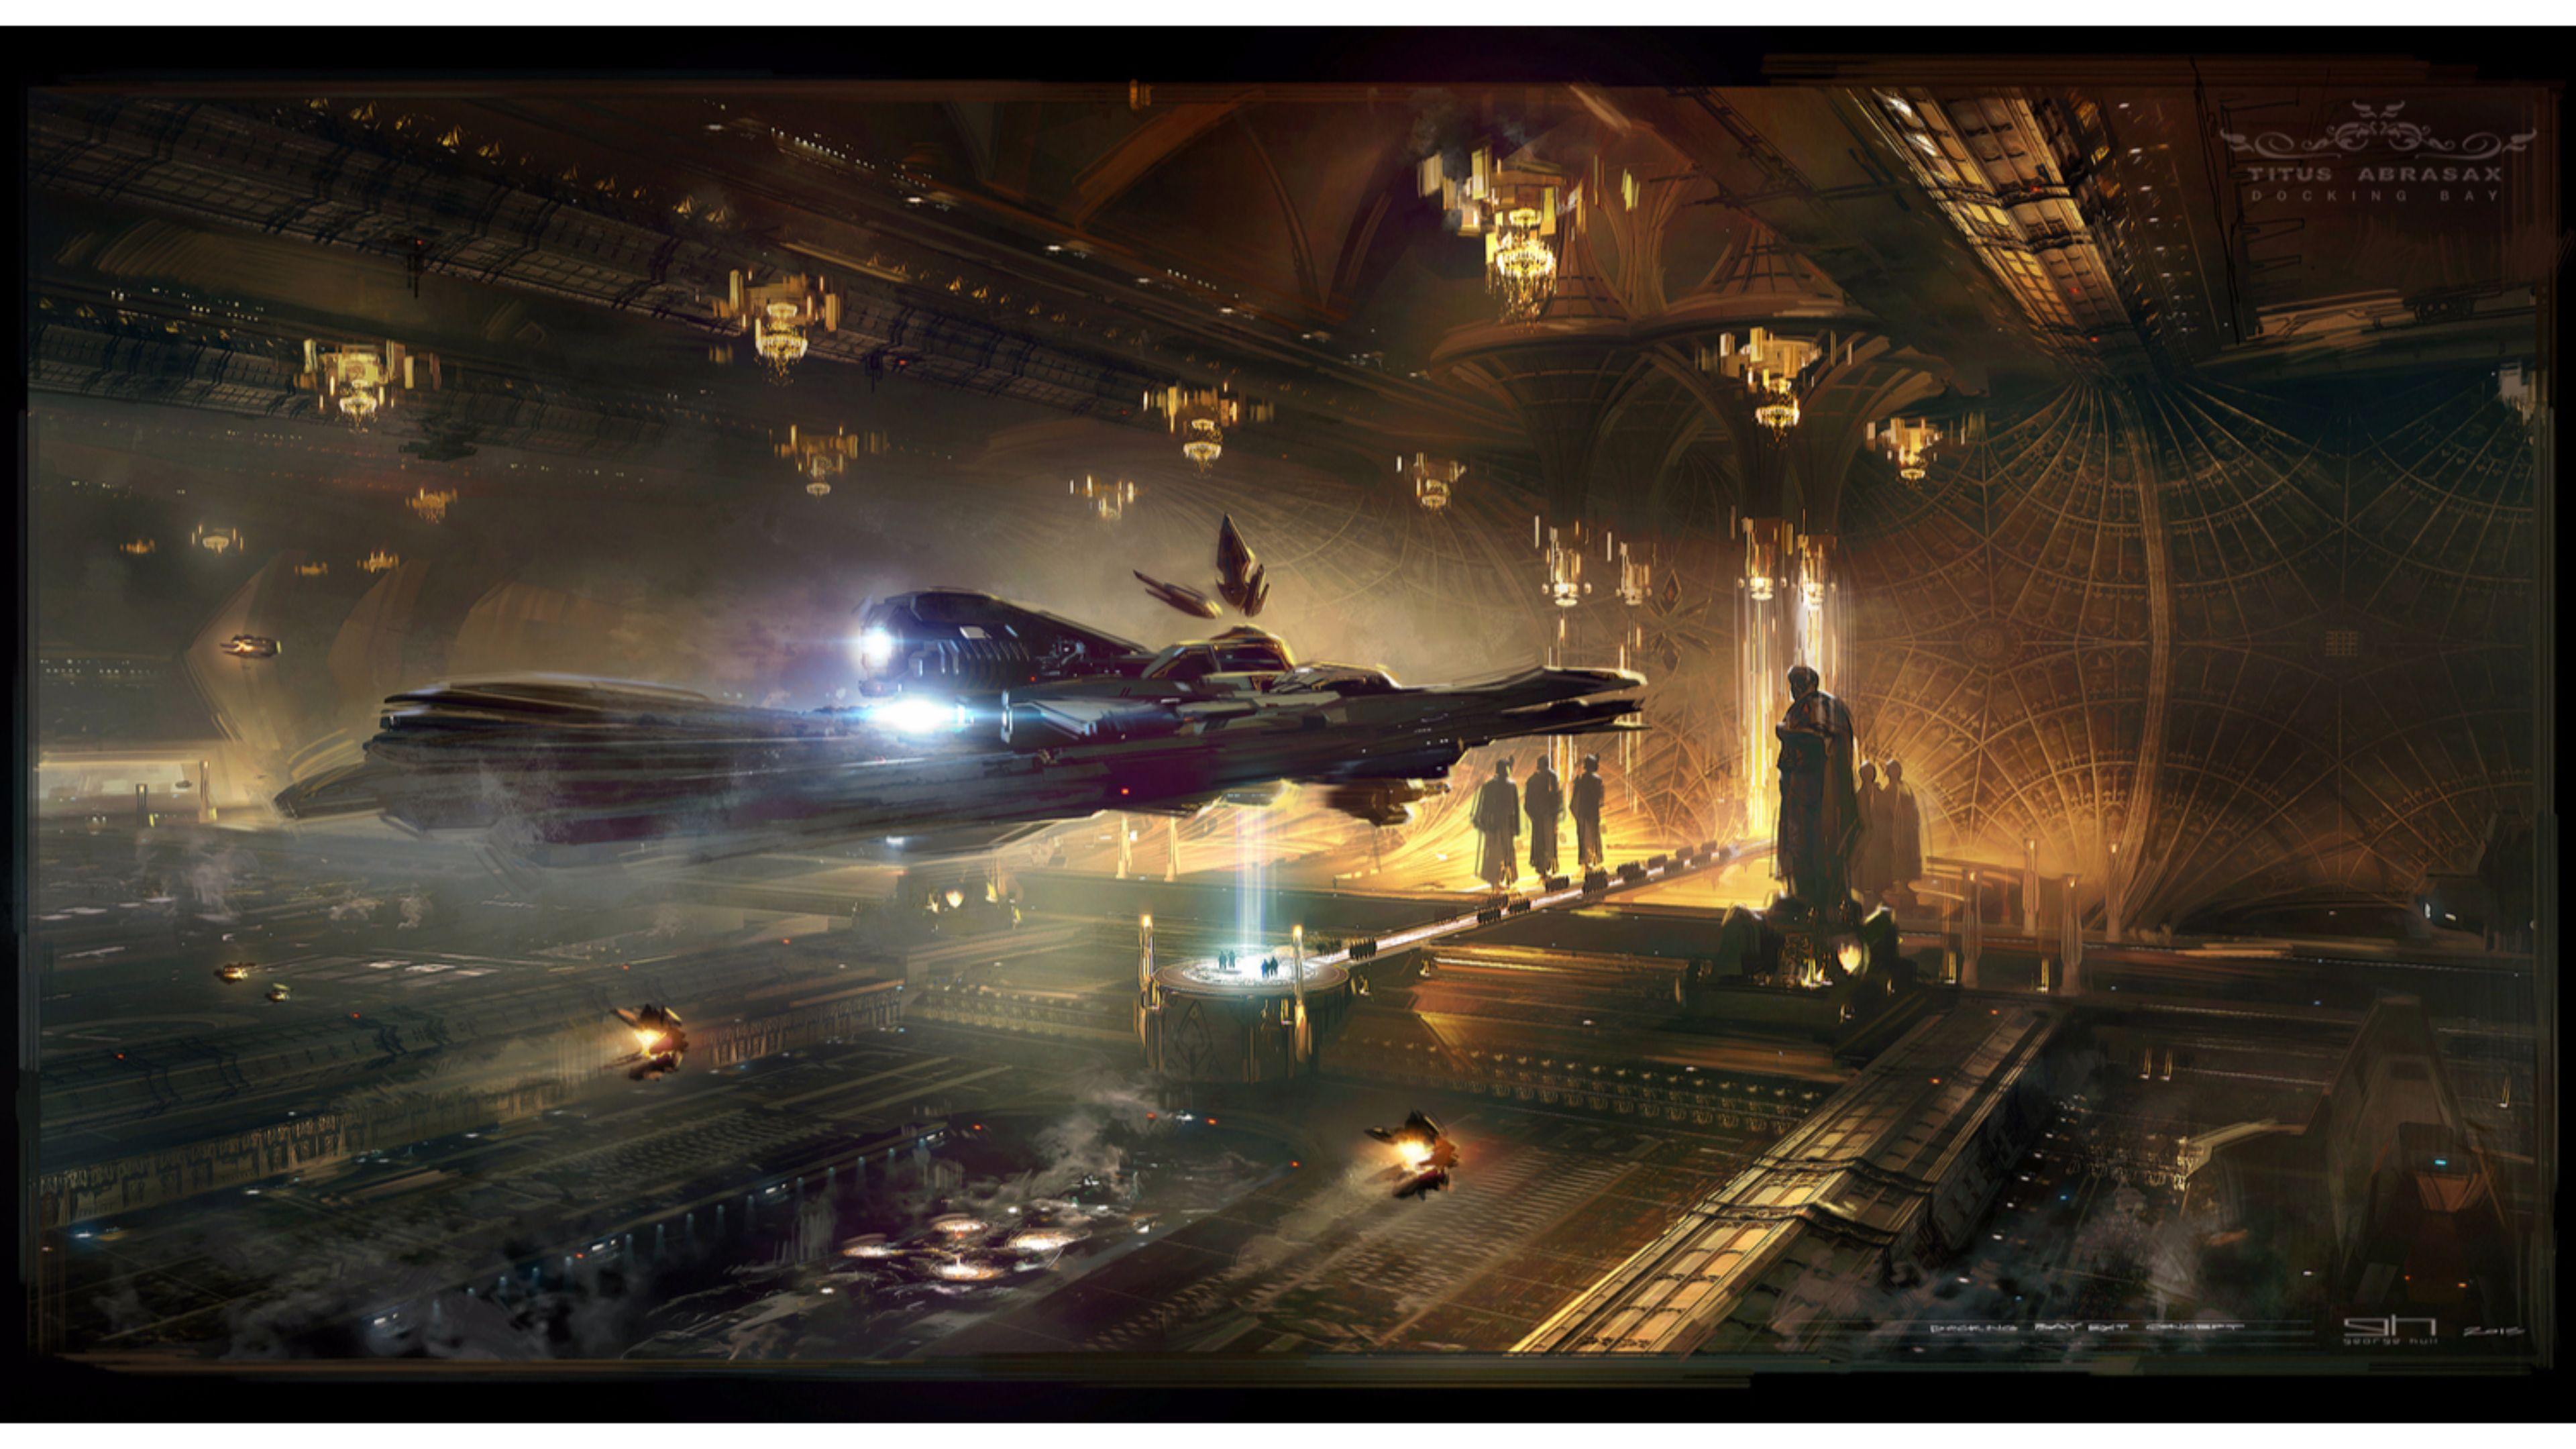 Jupiter Ascending Retina Movie Wallpaper: Popular Jupiter Ascending 4K Wallpaper